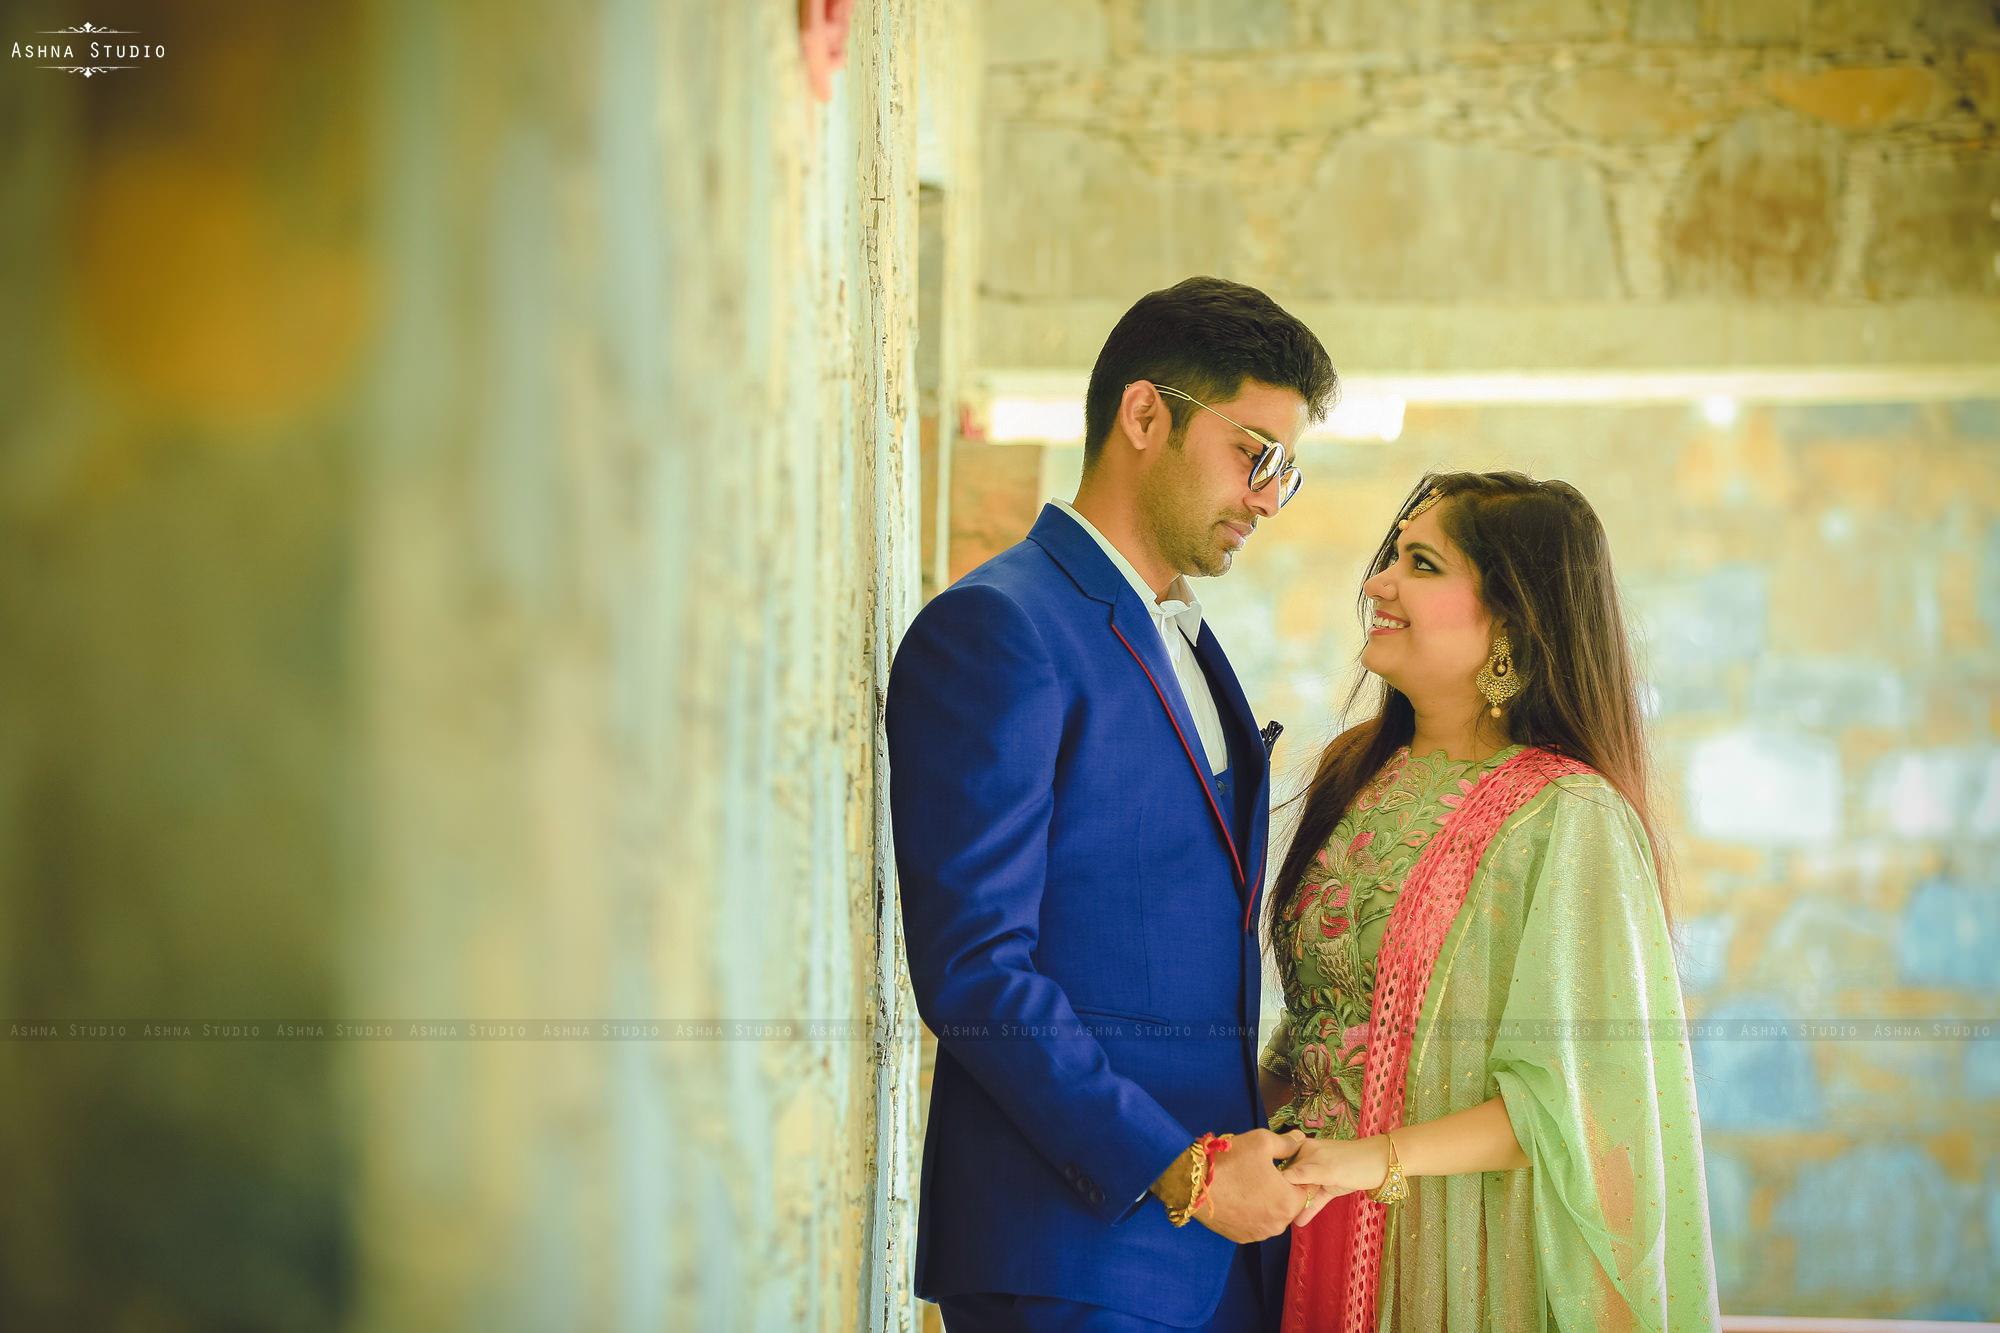 Himani & Nilesh Pre Wedding Photoshoot at The Amargarh Resort Udaipur